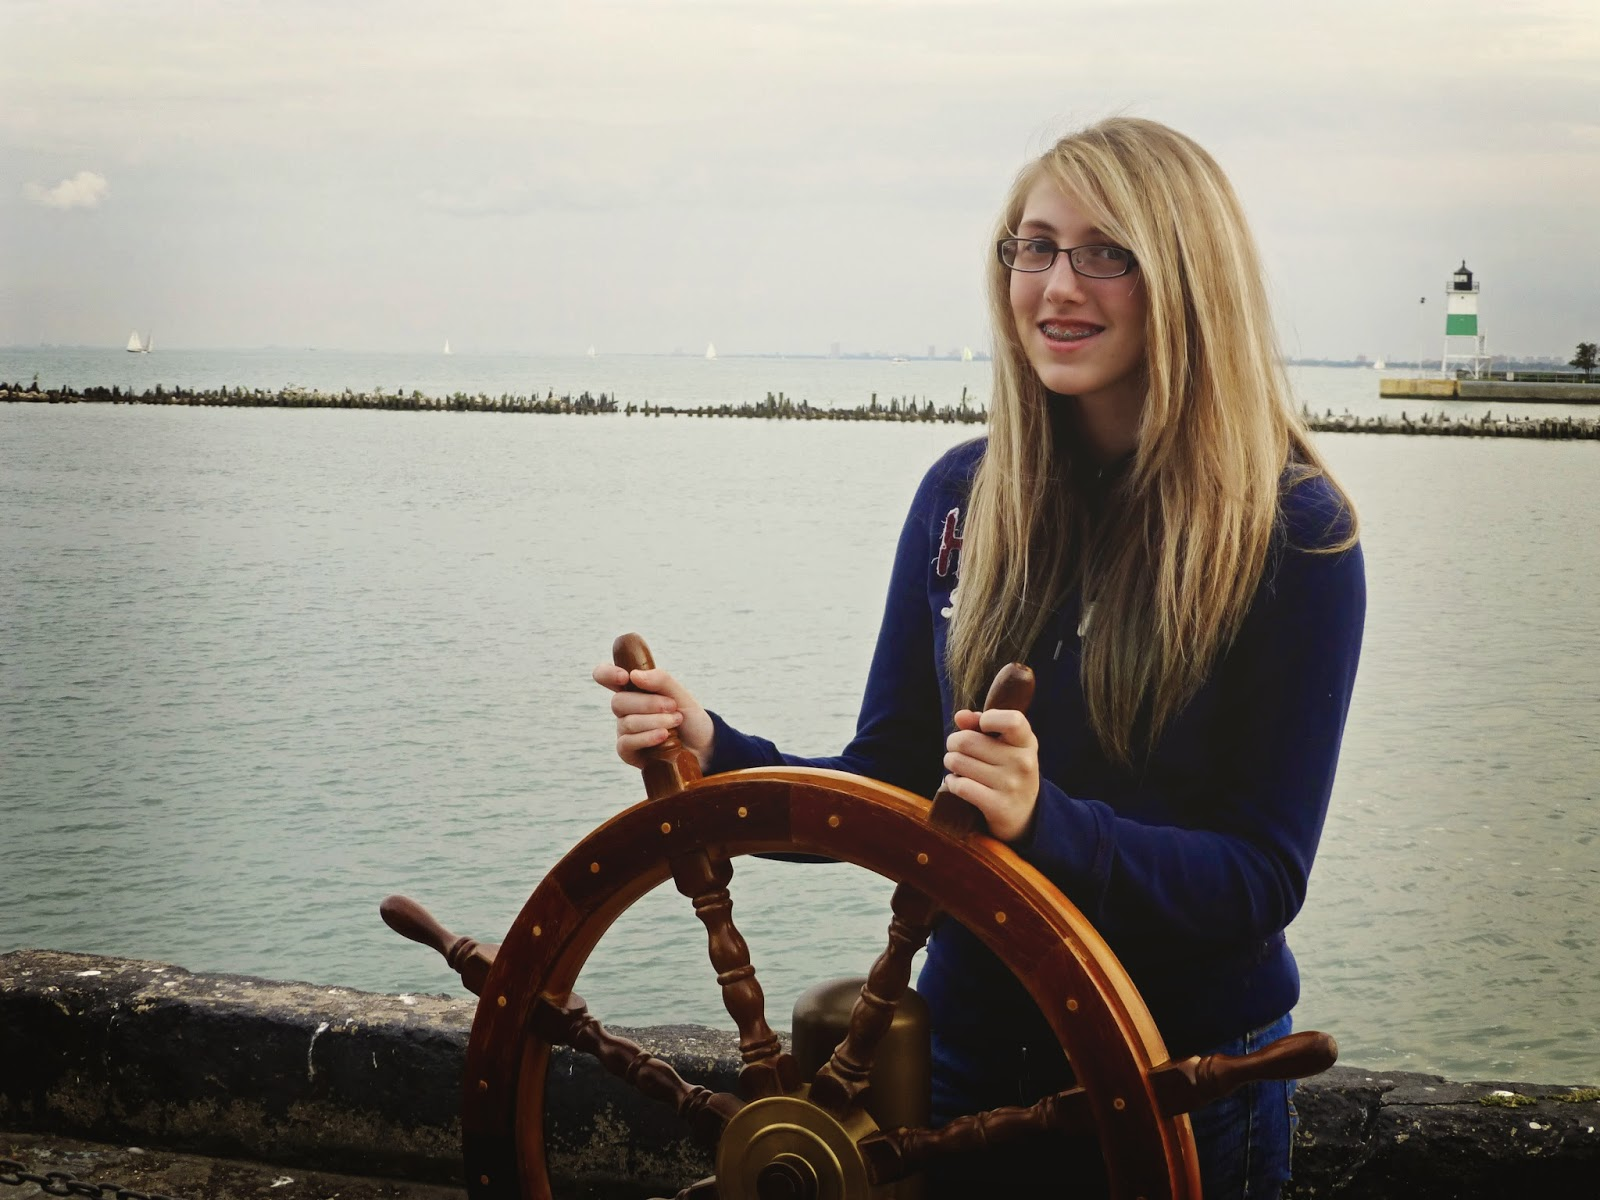 sailing girl